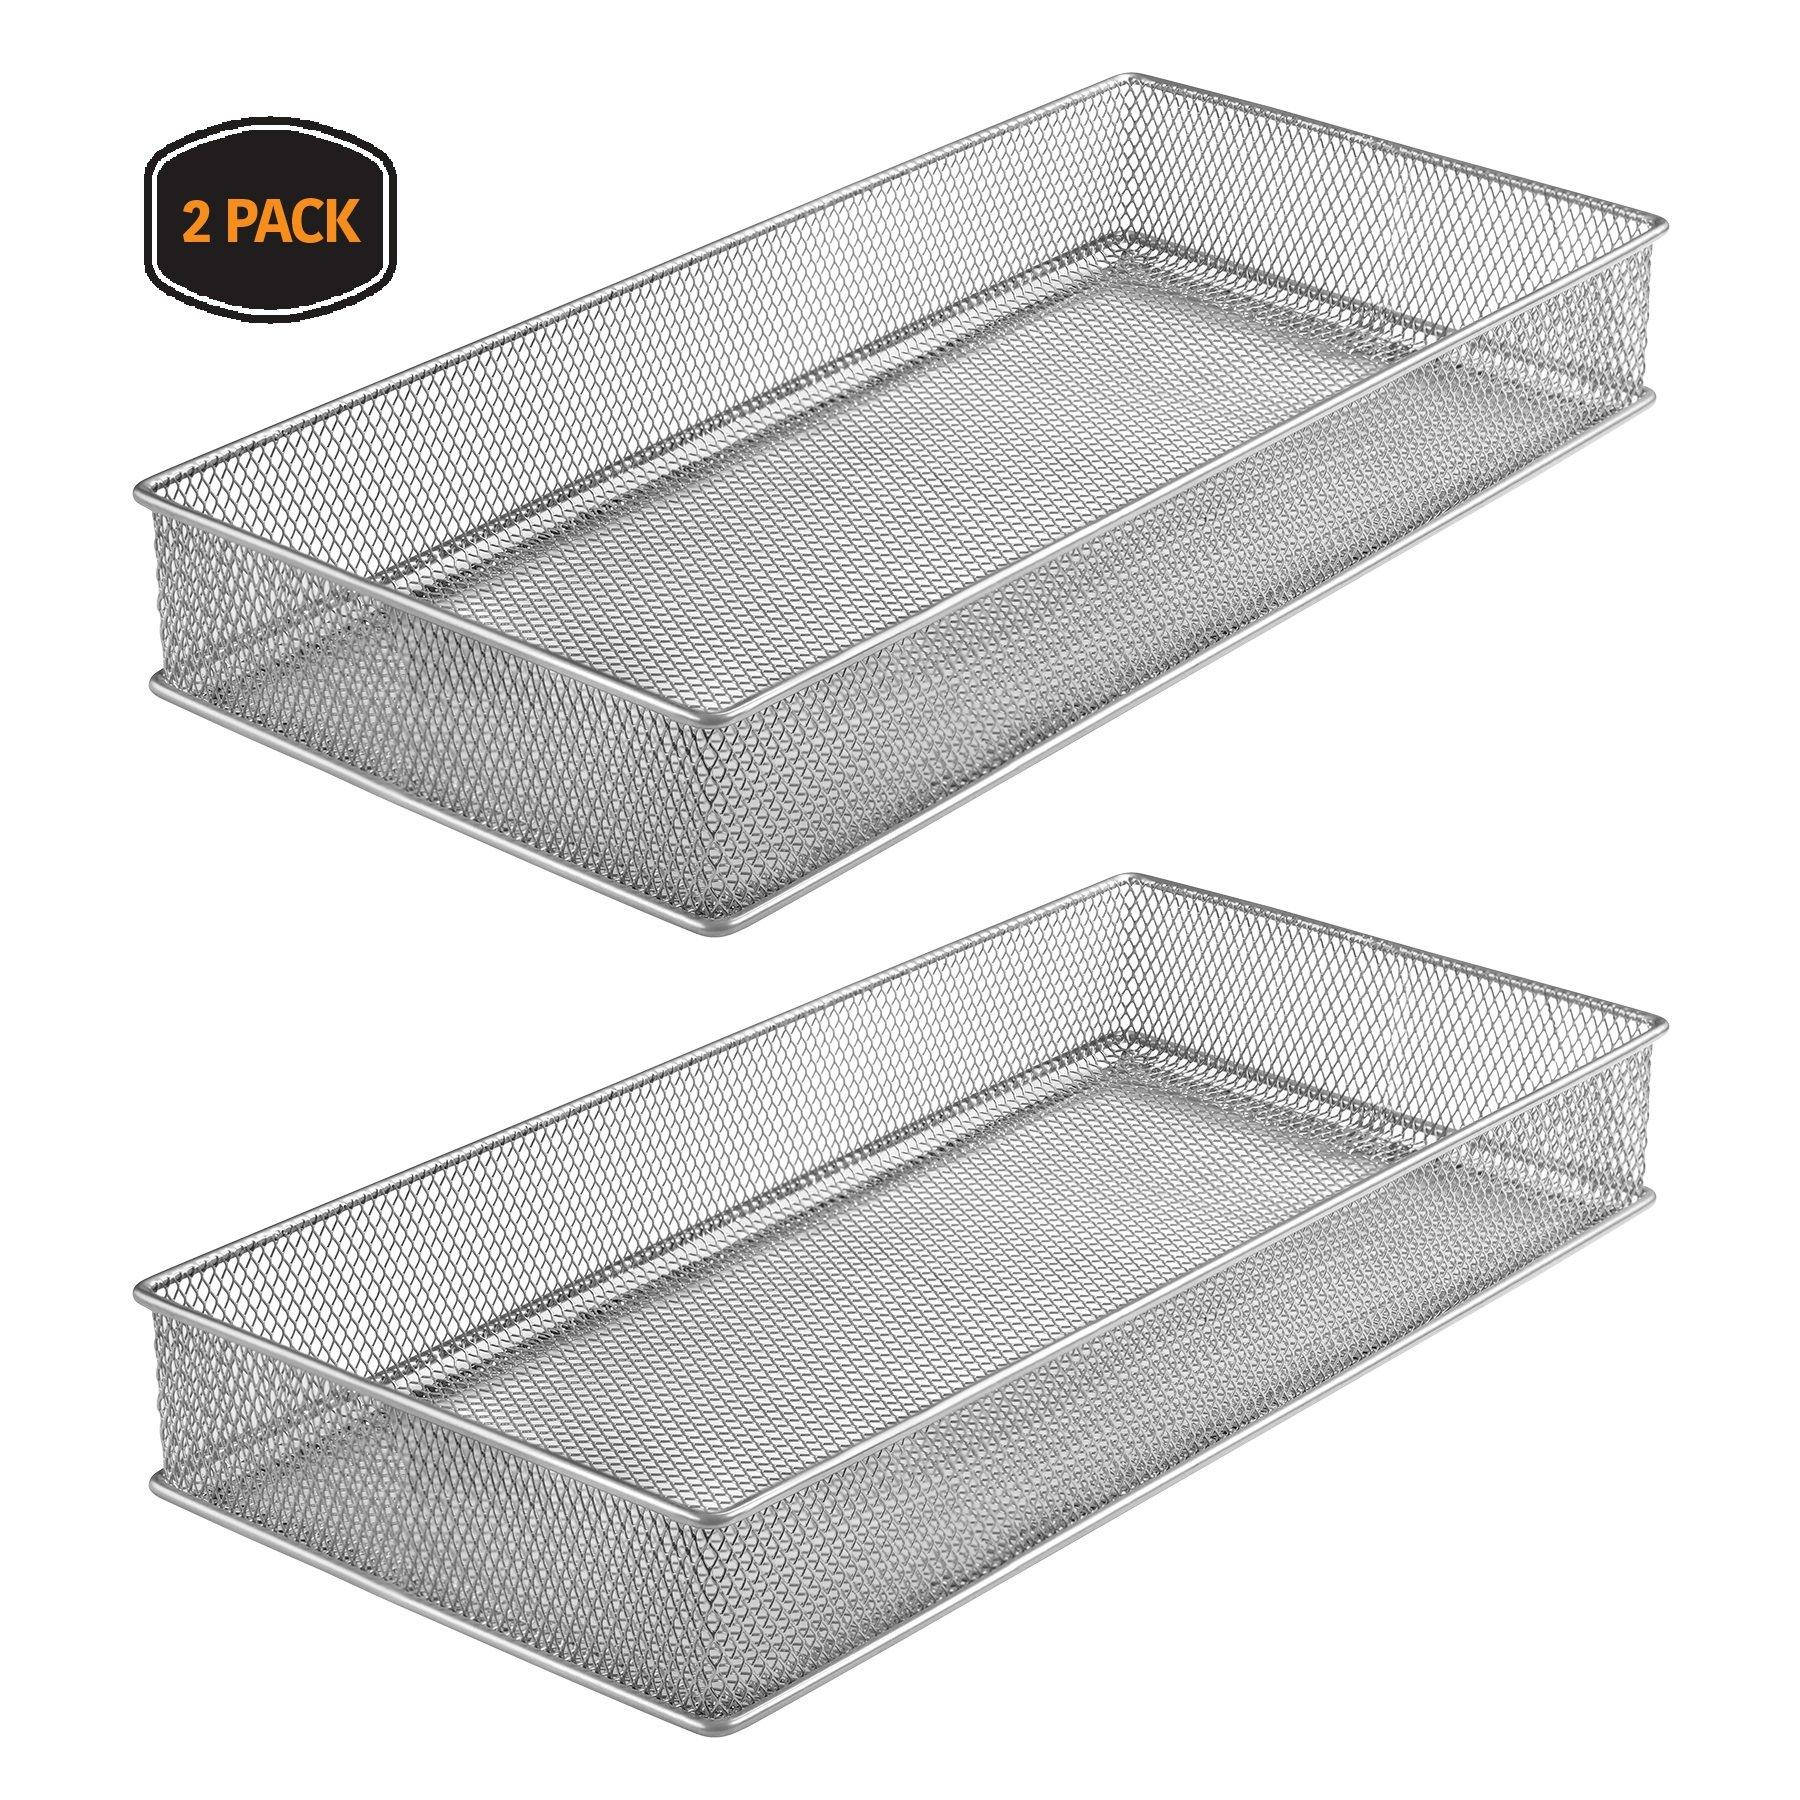 Ybm Home Silver Mesh Drawer Cabinet and or Shelf Organizer Bins, School Supply Holder Office Desktop Organizer Basket 1591s-2 (2, 6x12x2 Inch)